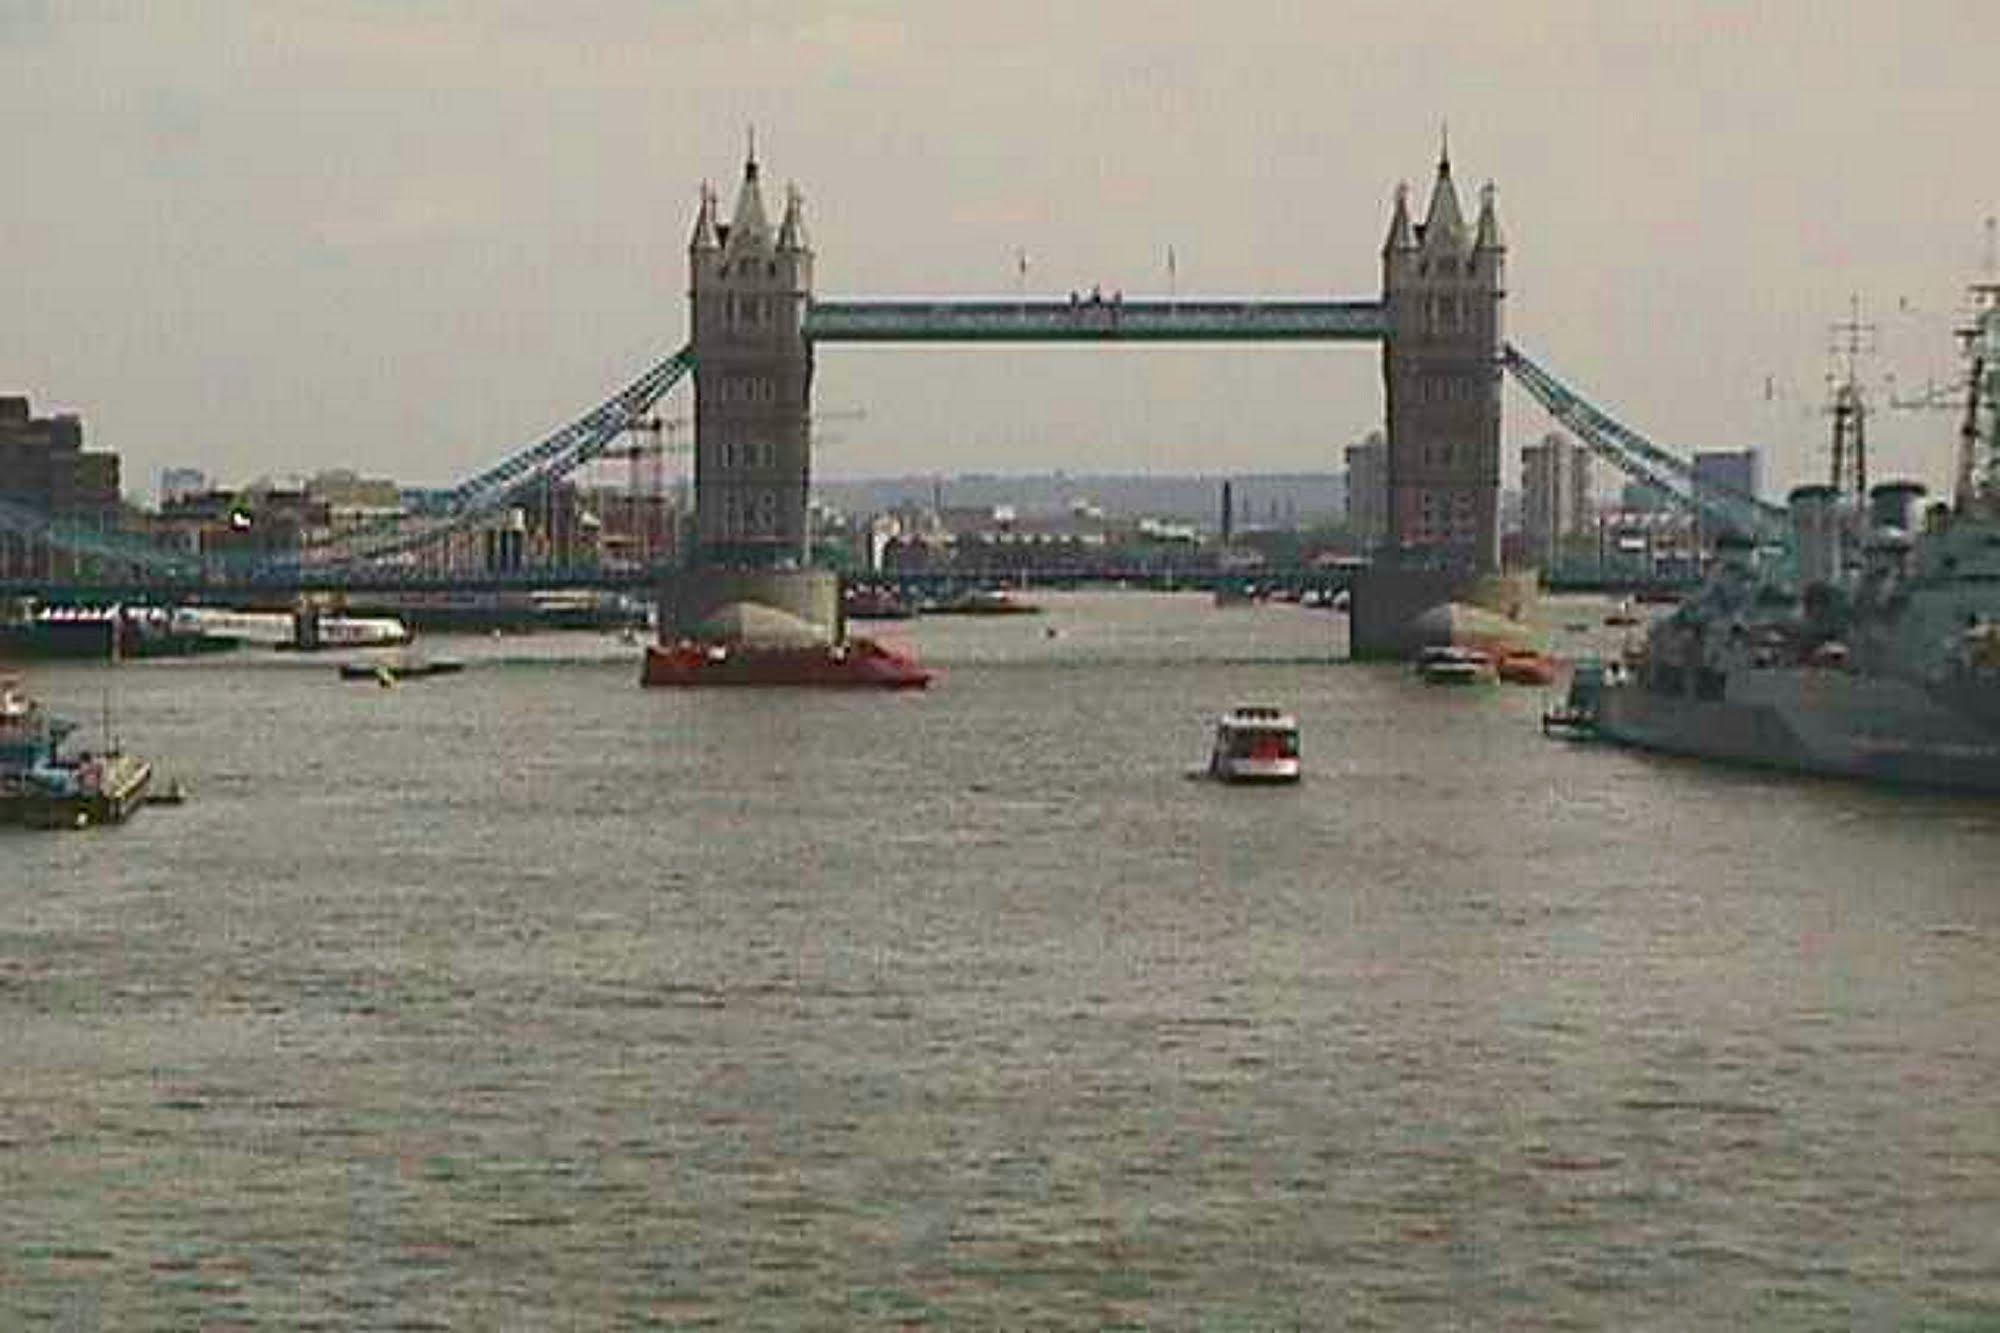 Singapore, London and the U.S.